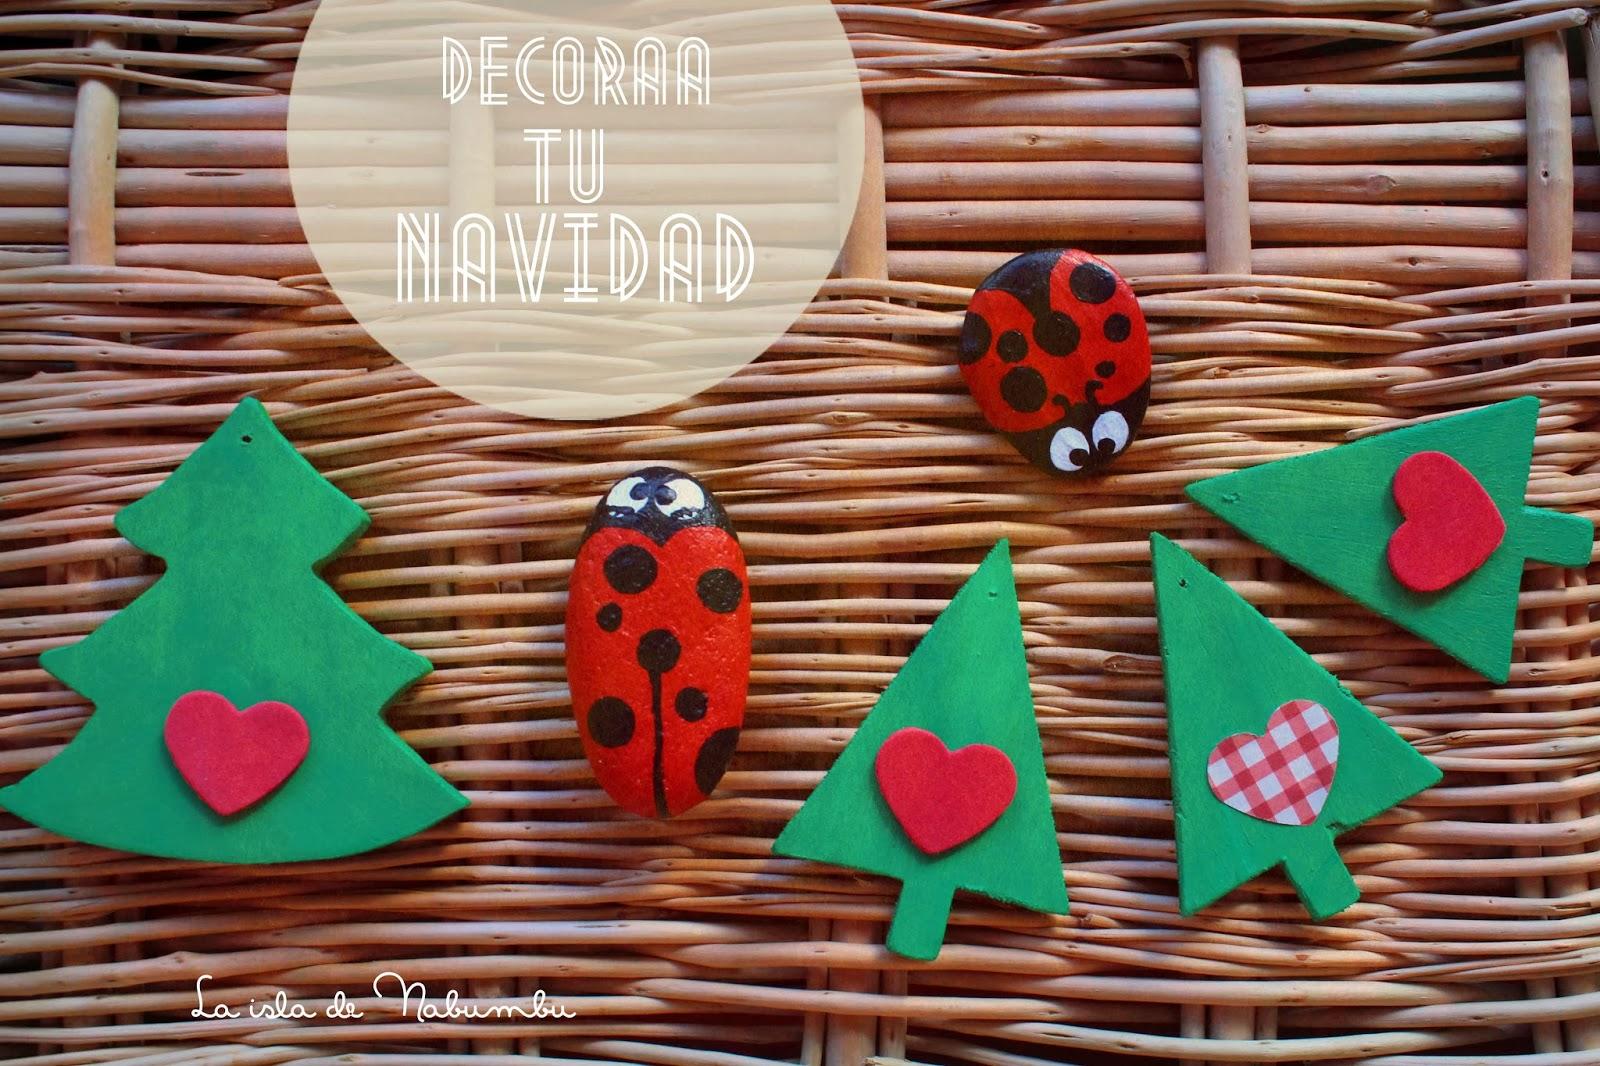 La isla de nabumbu decora tu rbol de navidad - Decora tu arbol de navidad ...